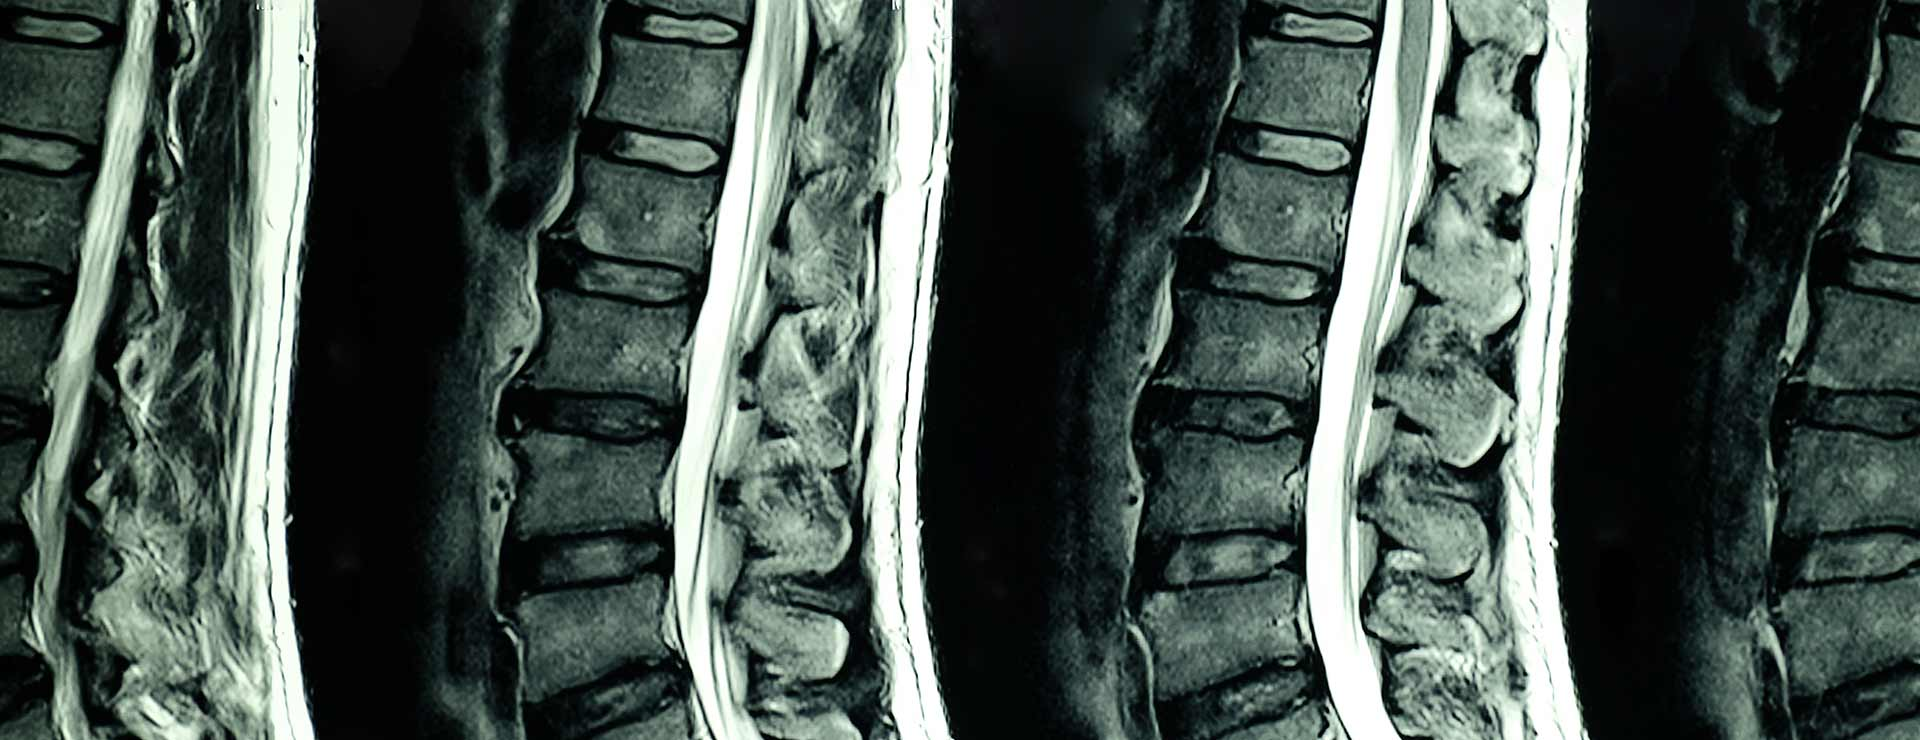 Lumbar Puncture | Johns Hopkins Medicine